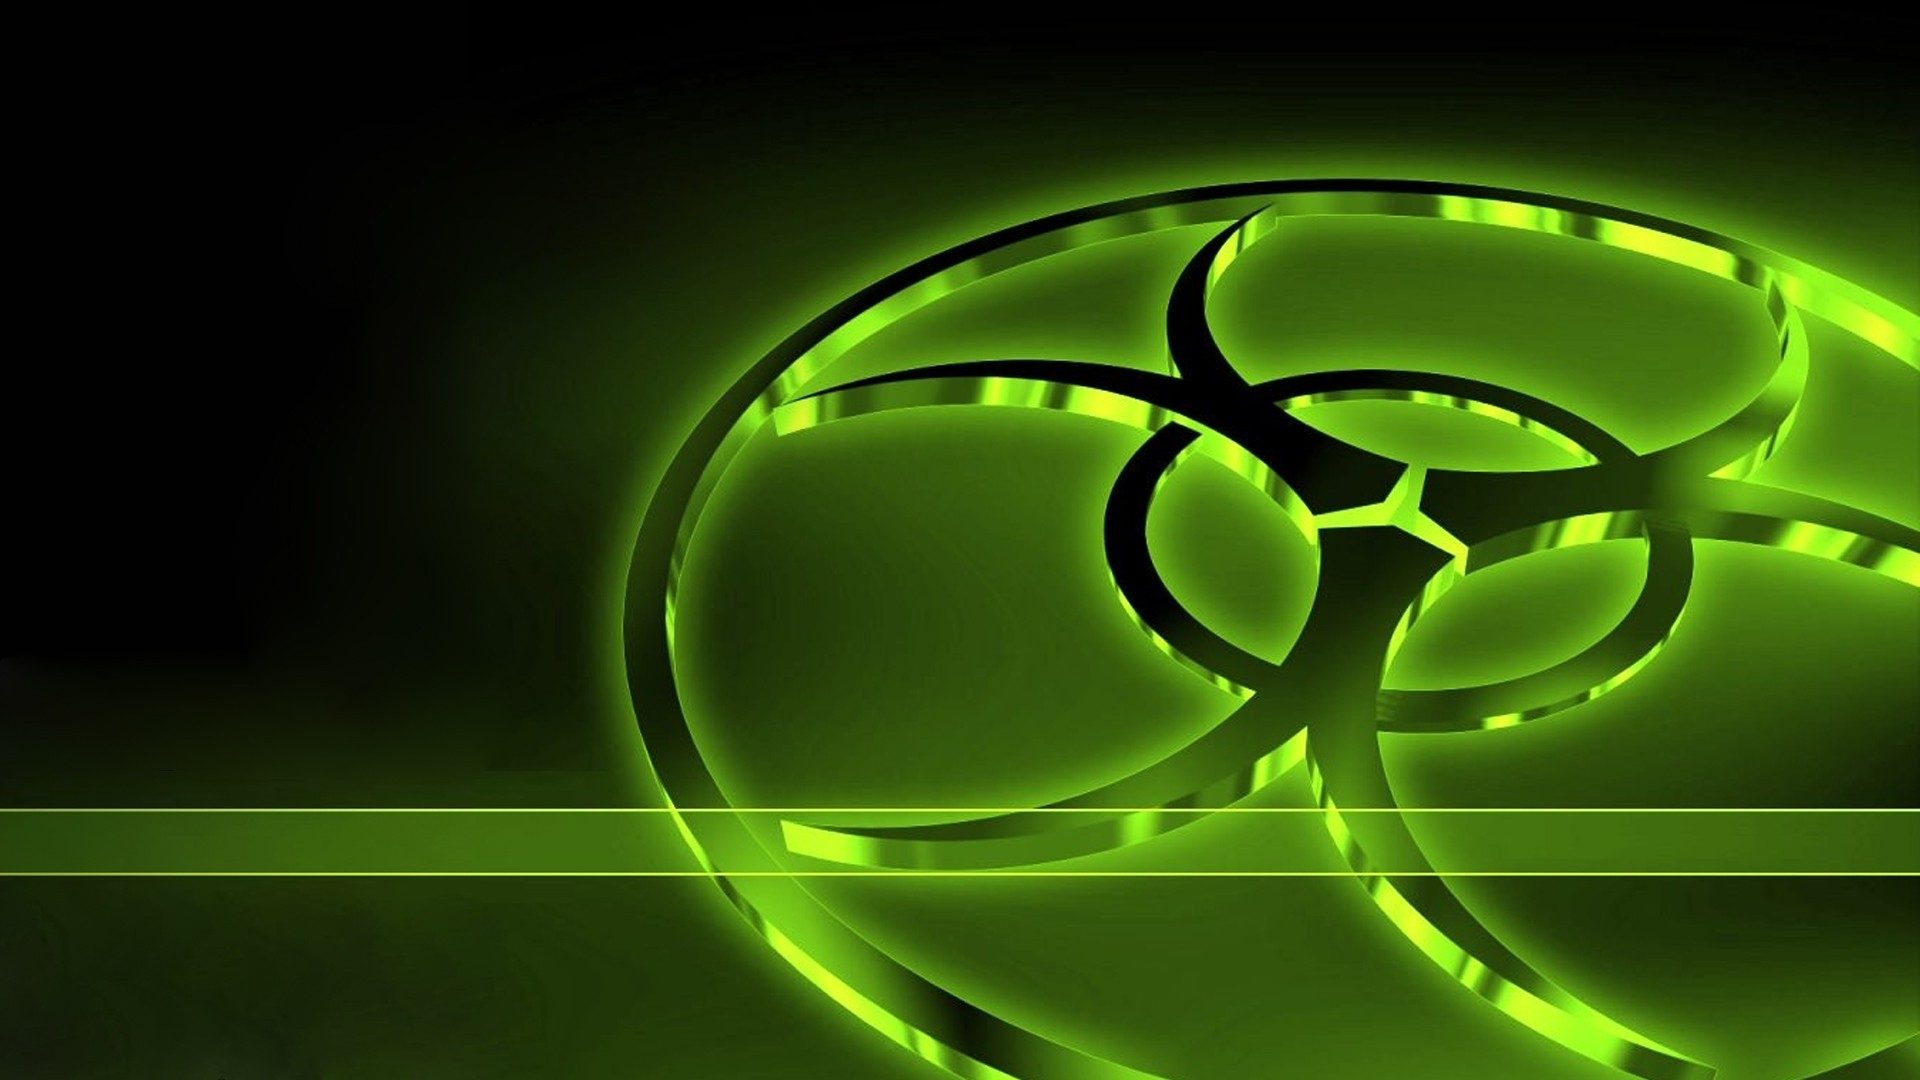 green biohazard black background neon 3d graphics 1920x1080 wallpaper 1920x1080